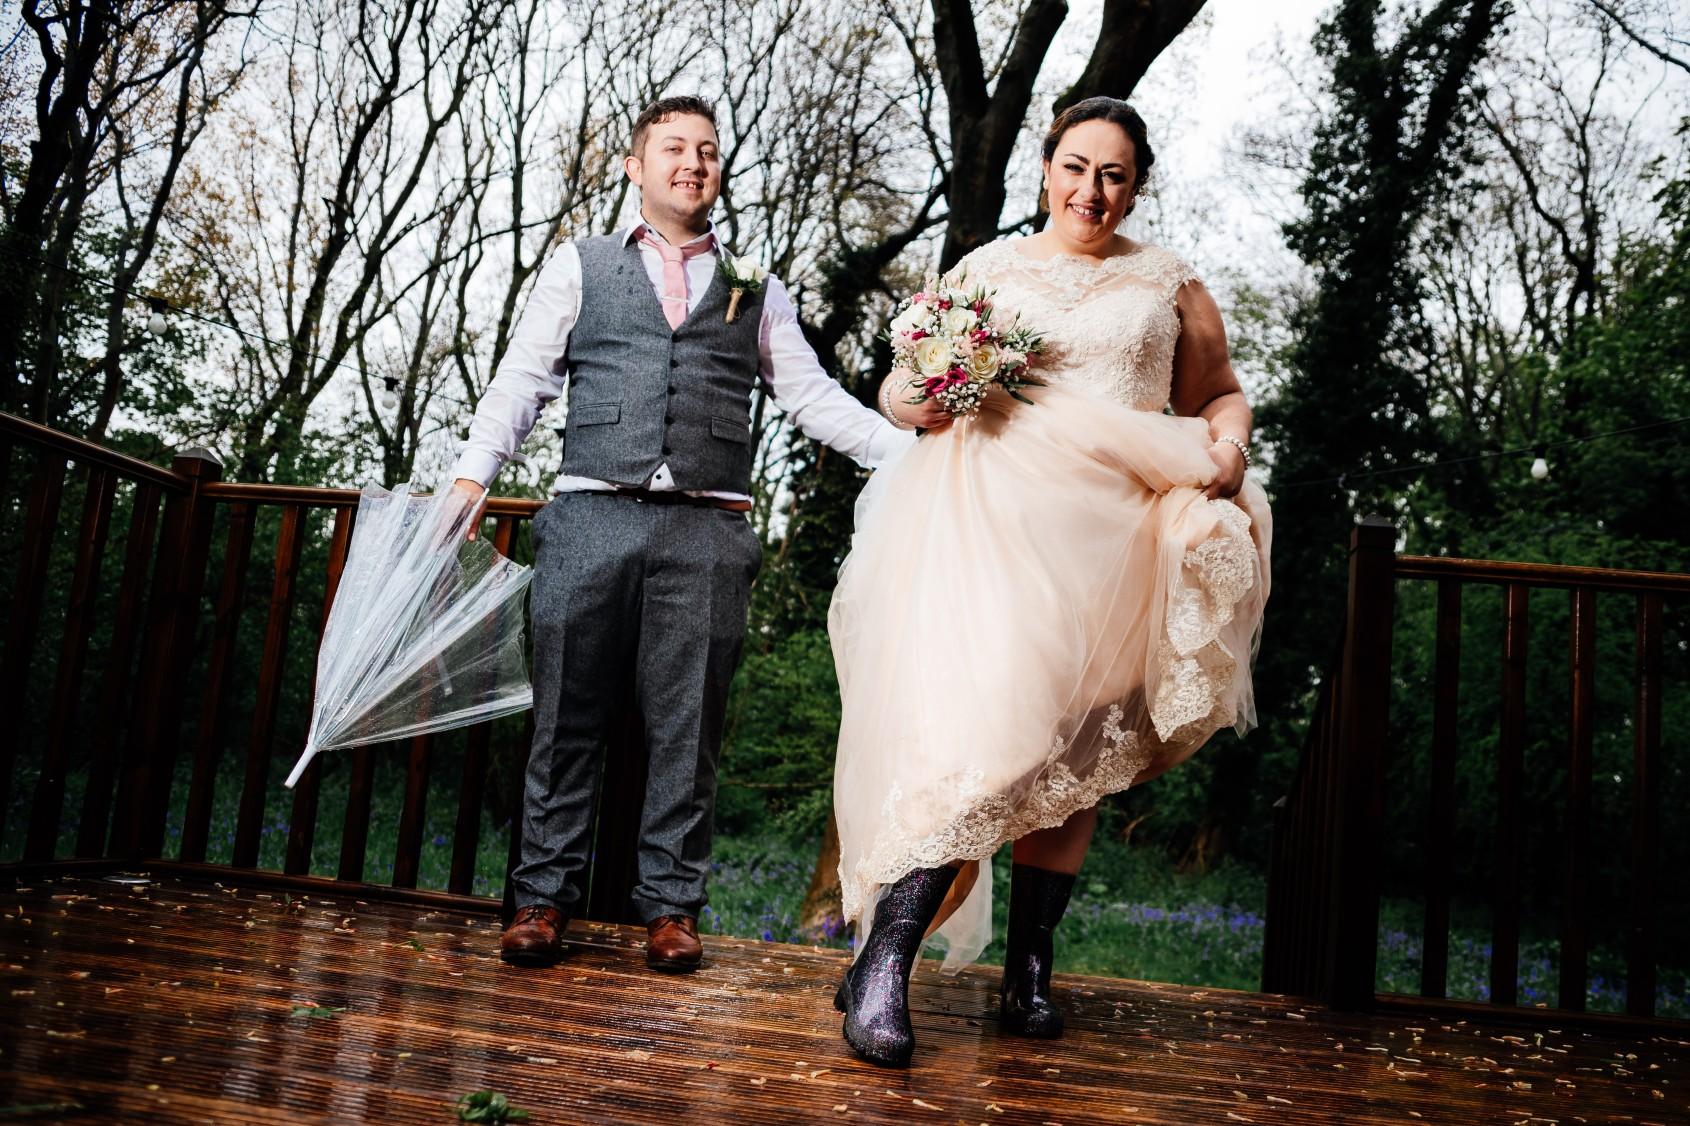 bride and groom dancing in the rain - fun wedding photos - rainy wedding - rain wedding advice - fun wedding planning - wedding planning blog - rain wedding photos